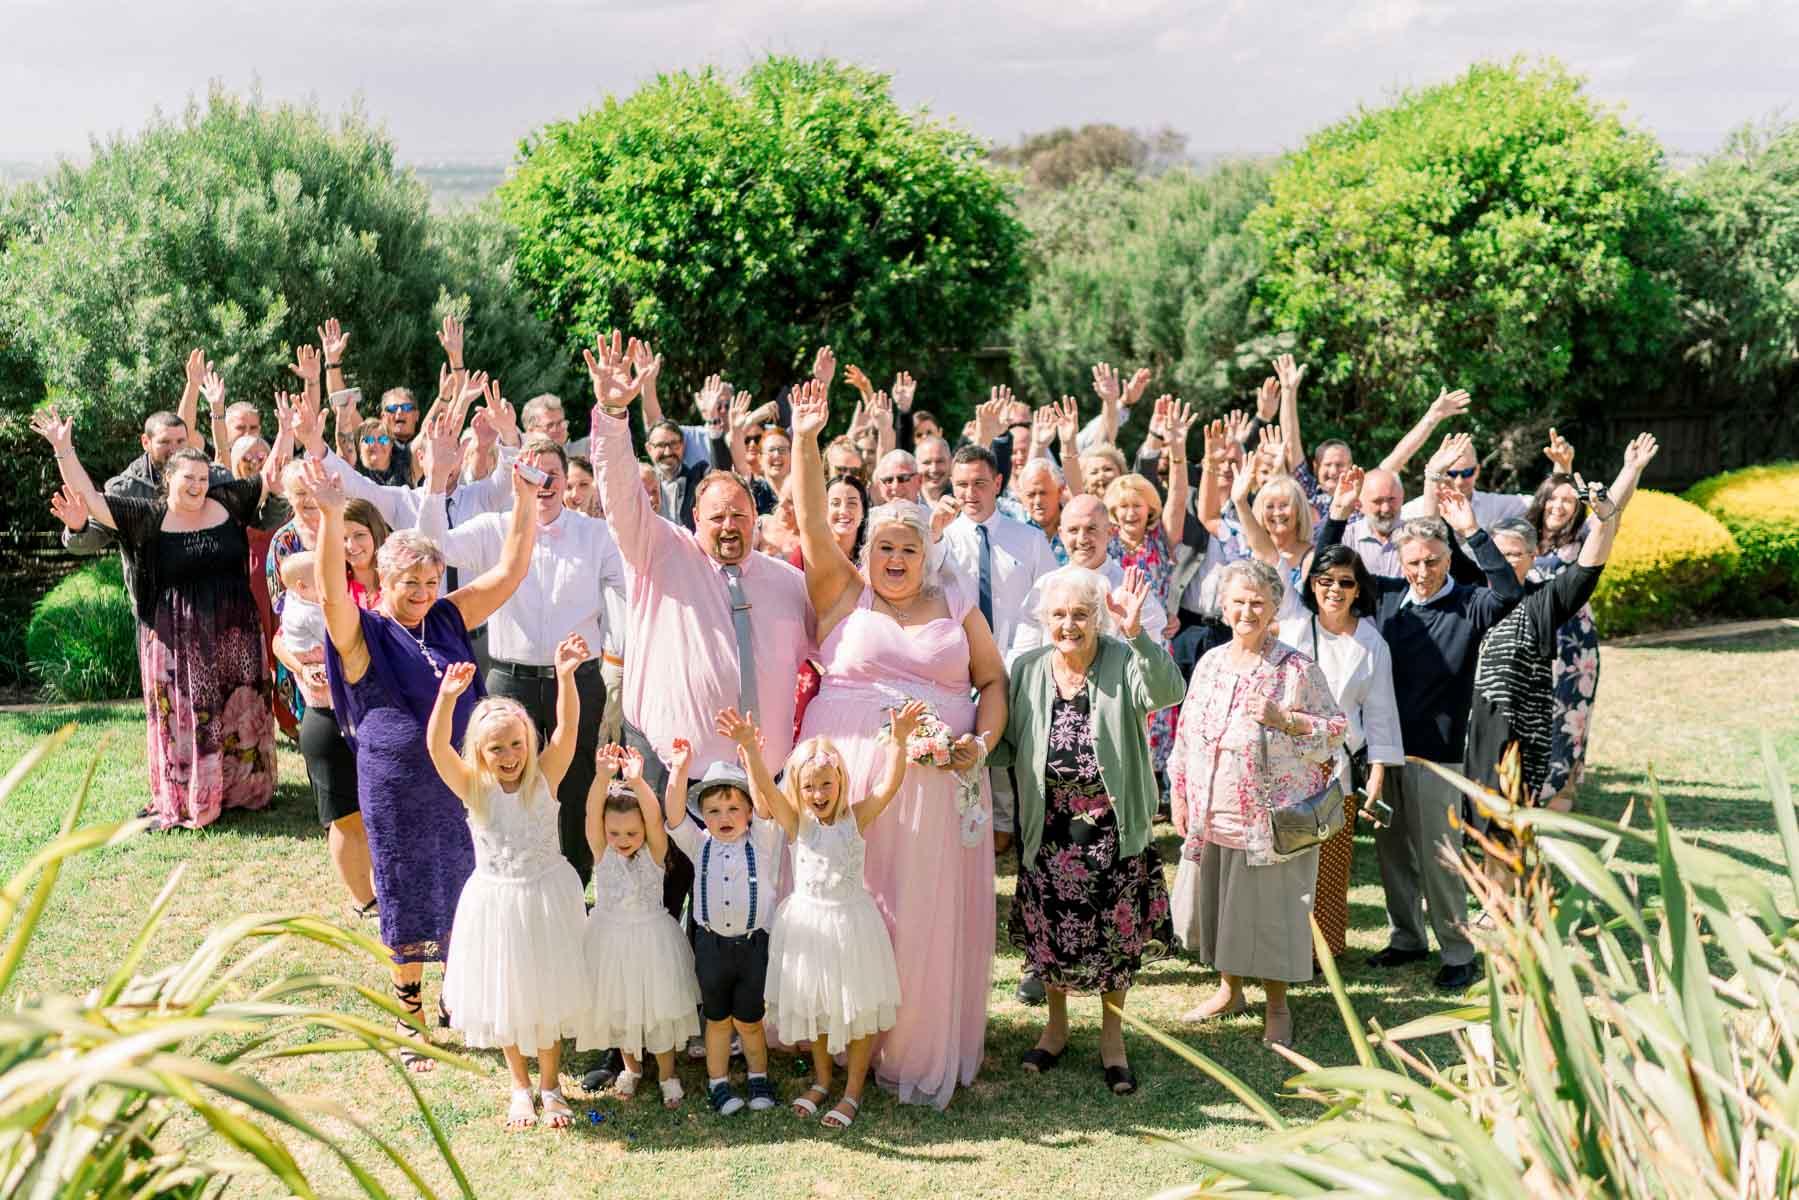 mt-eliza-mornington-peninsula-backyard-wedding-heart+soul-weddings-allison-matt-03434.jpg